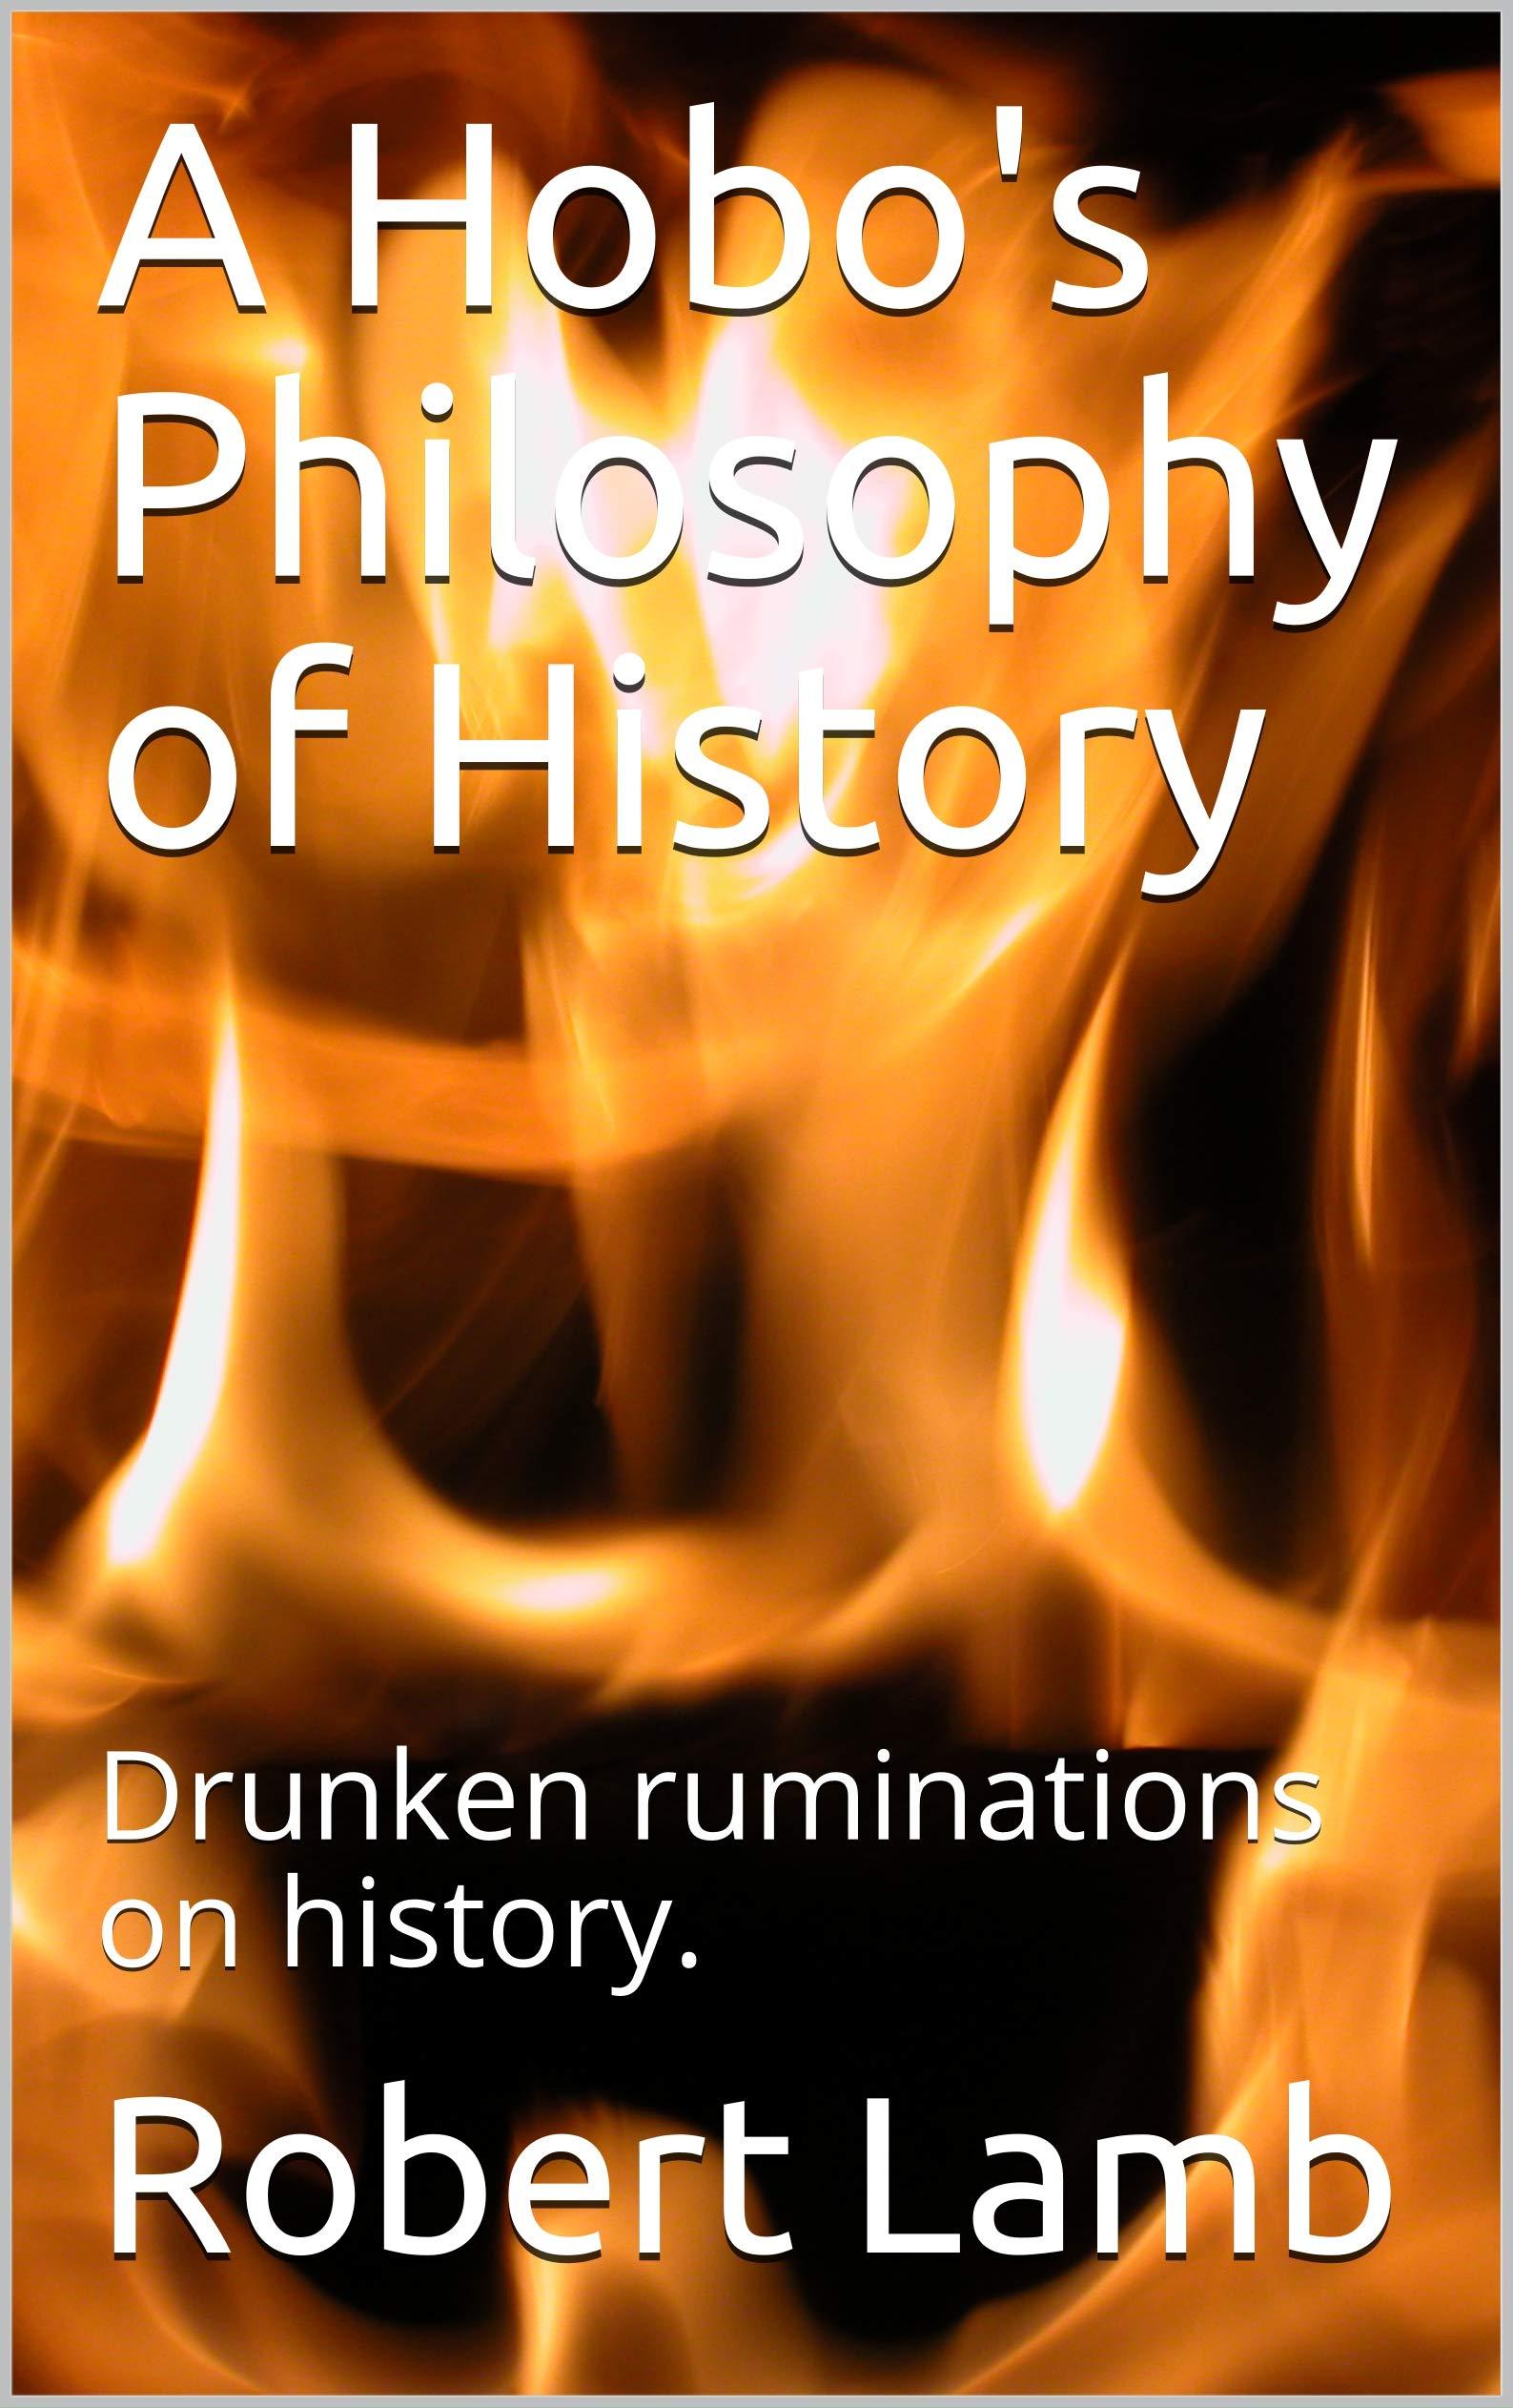 A Hobo's Philosophy of History: Drunken Ruminations on History.